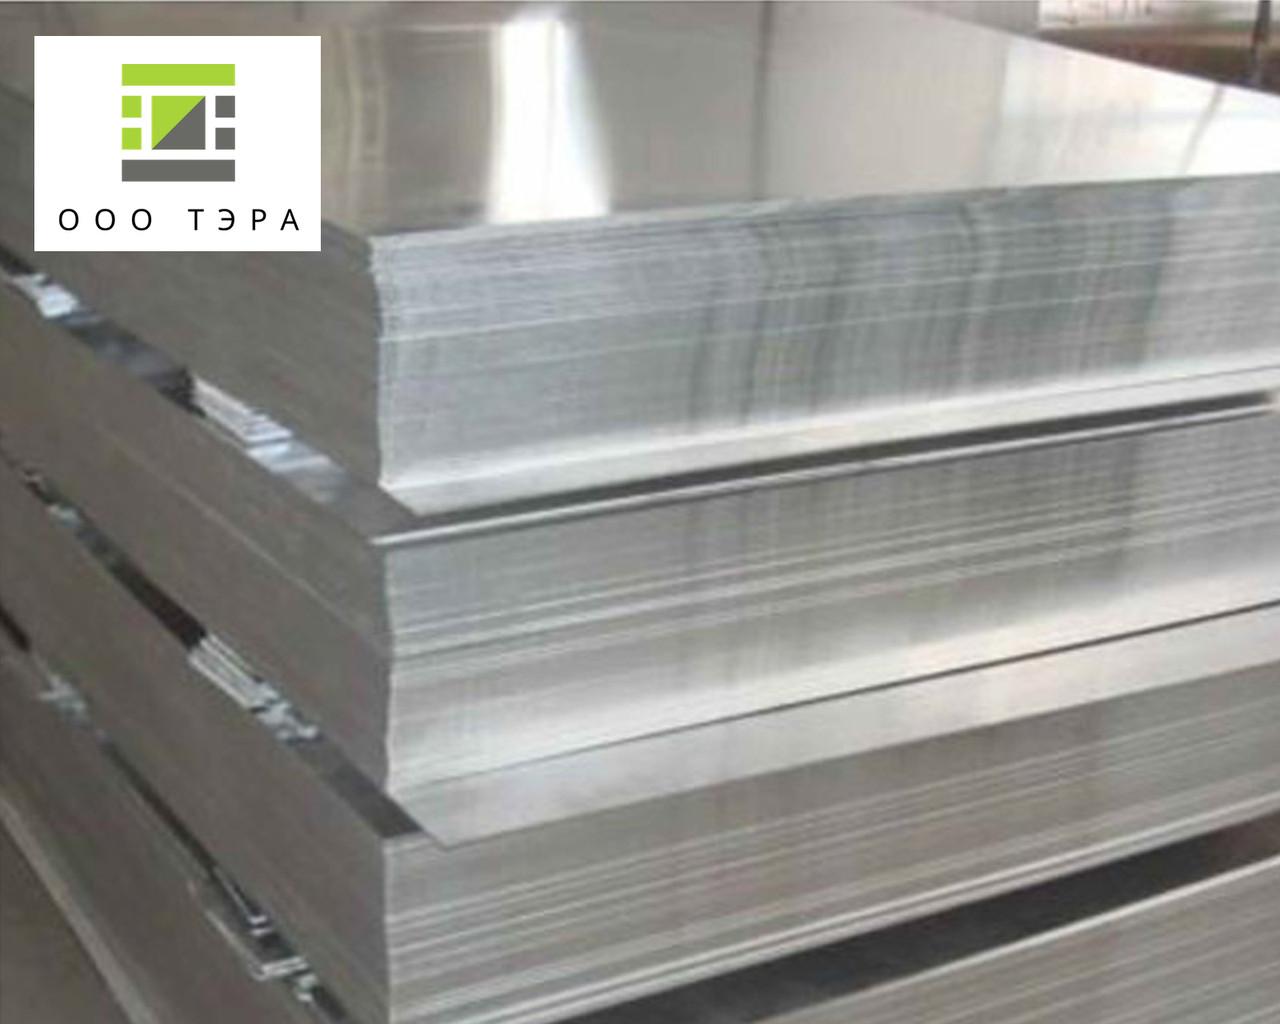 Лист алюминиевый 1.0 мм Д16АМ 1500х4000 дюраль